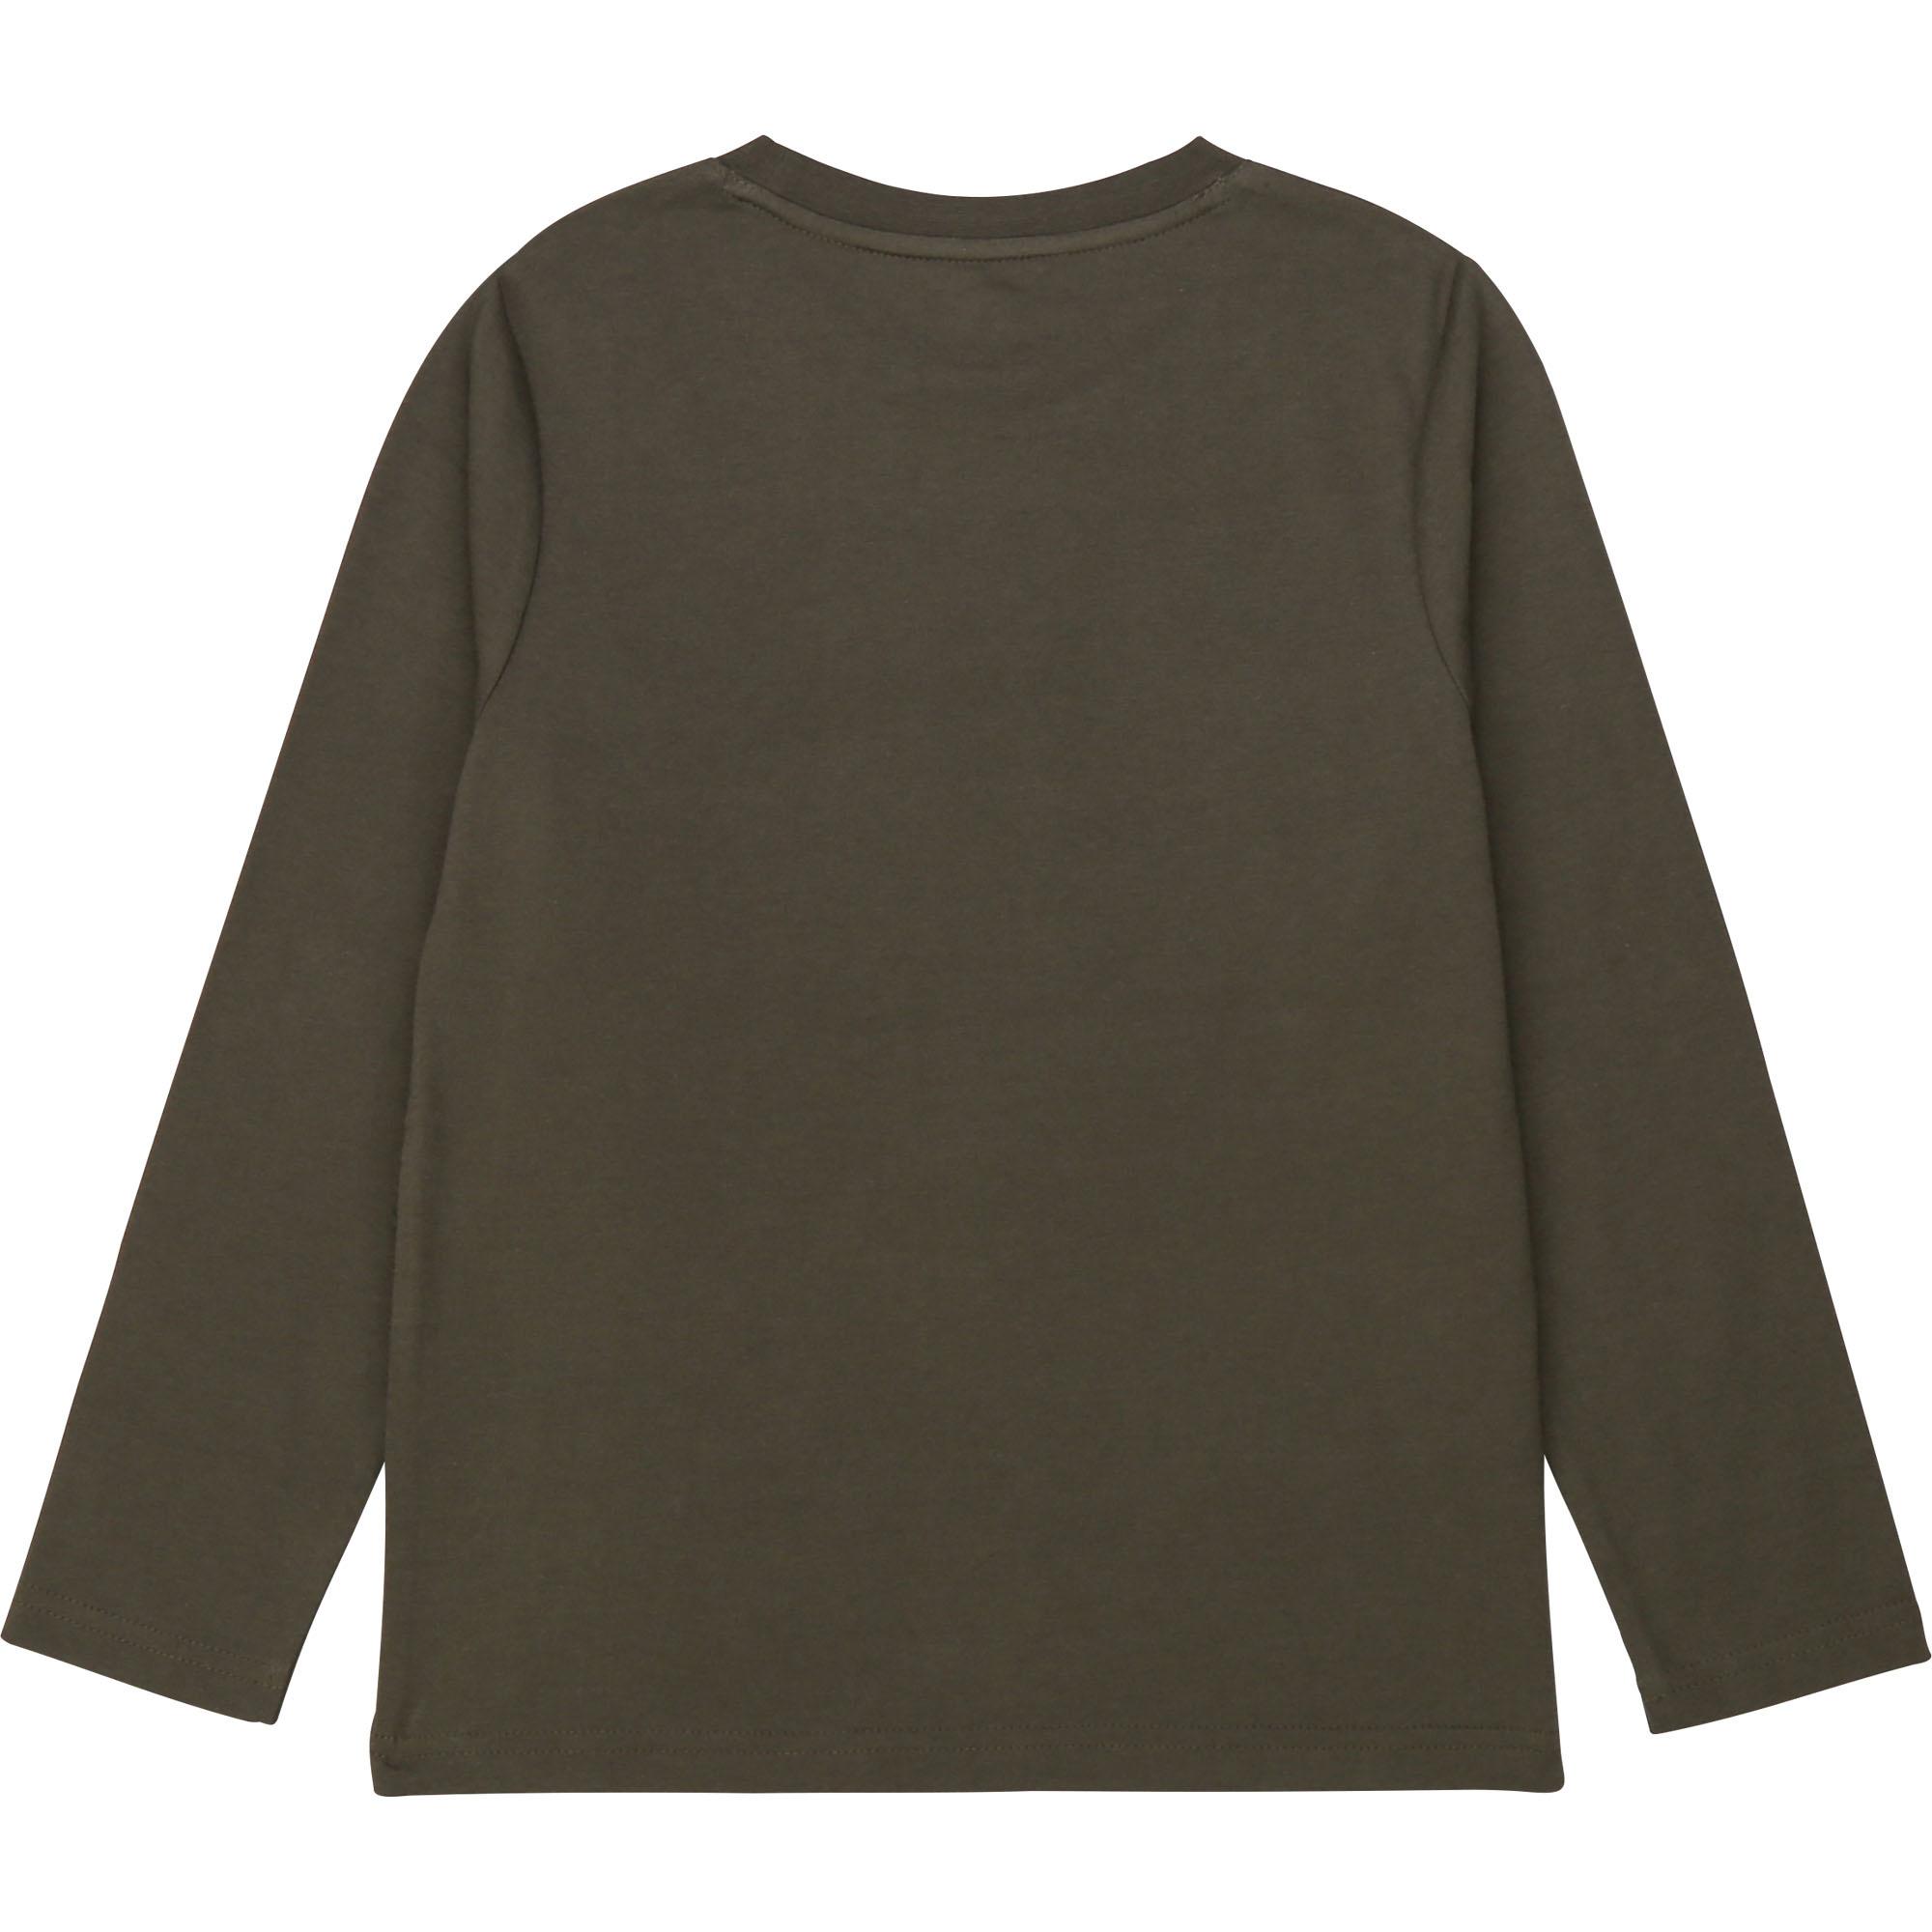 TIMBERLAND t-shirt en coton biologique-2